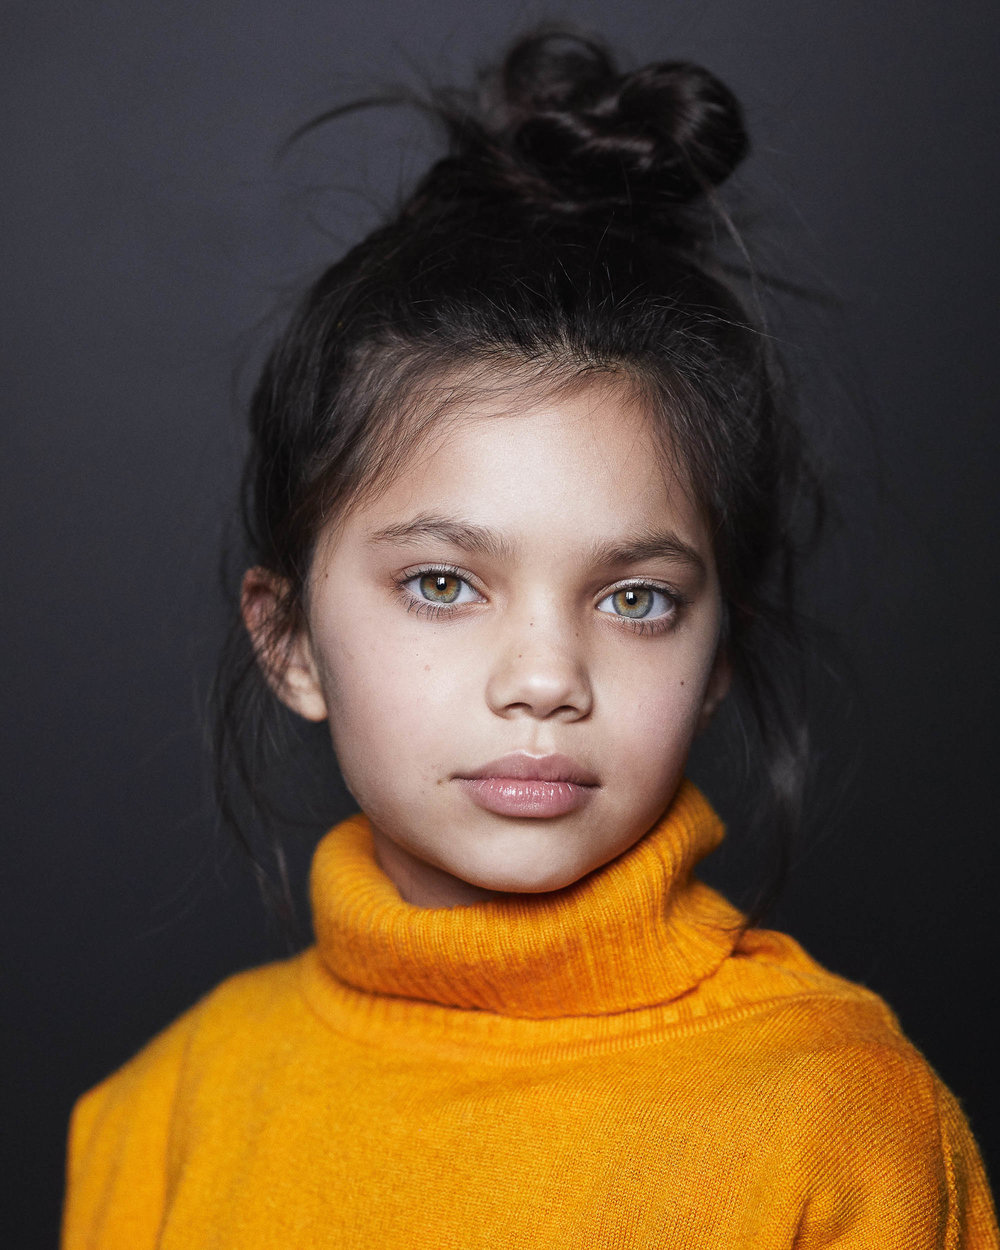 Youth Headshot taken by photographer Nick Walters at Lumi Studio5.jpg